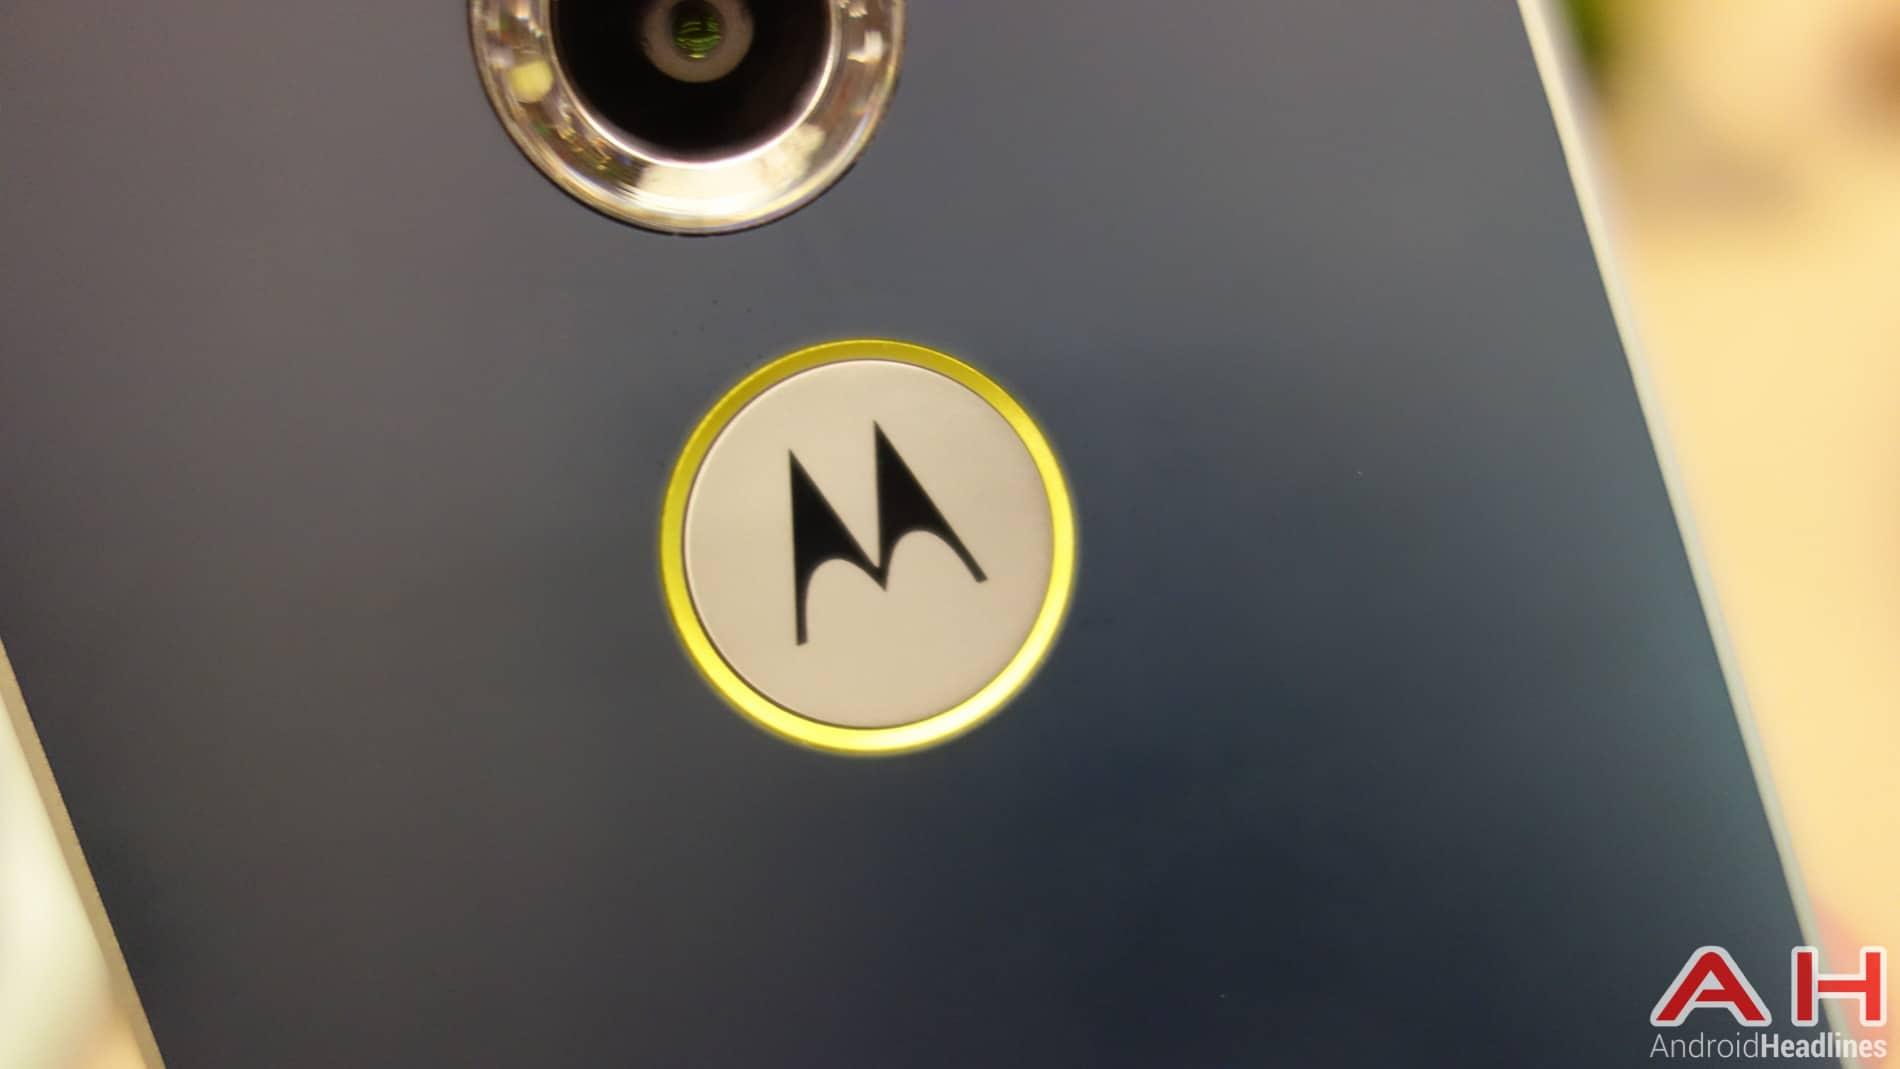 Motorola AH 176